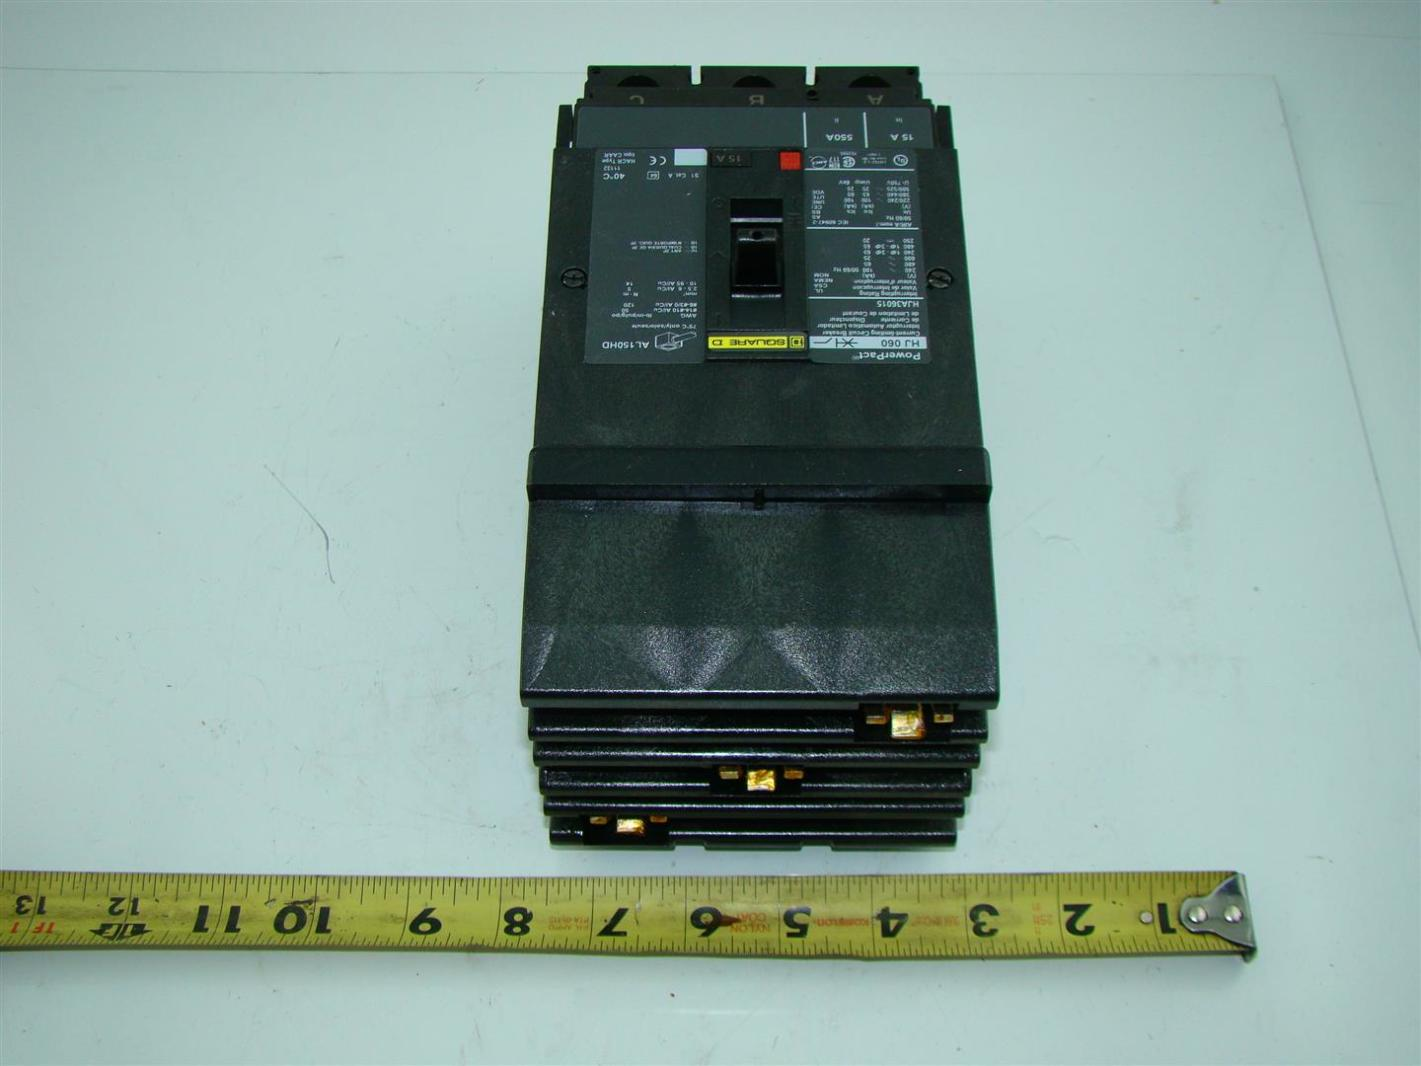 Panel Breaker Box Wiring Diagram In Addition Square D Circuit Breakers